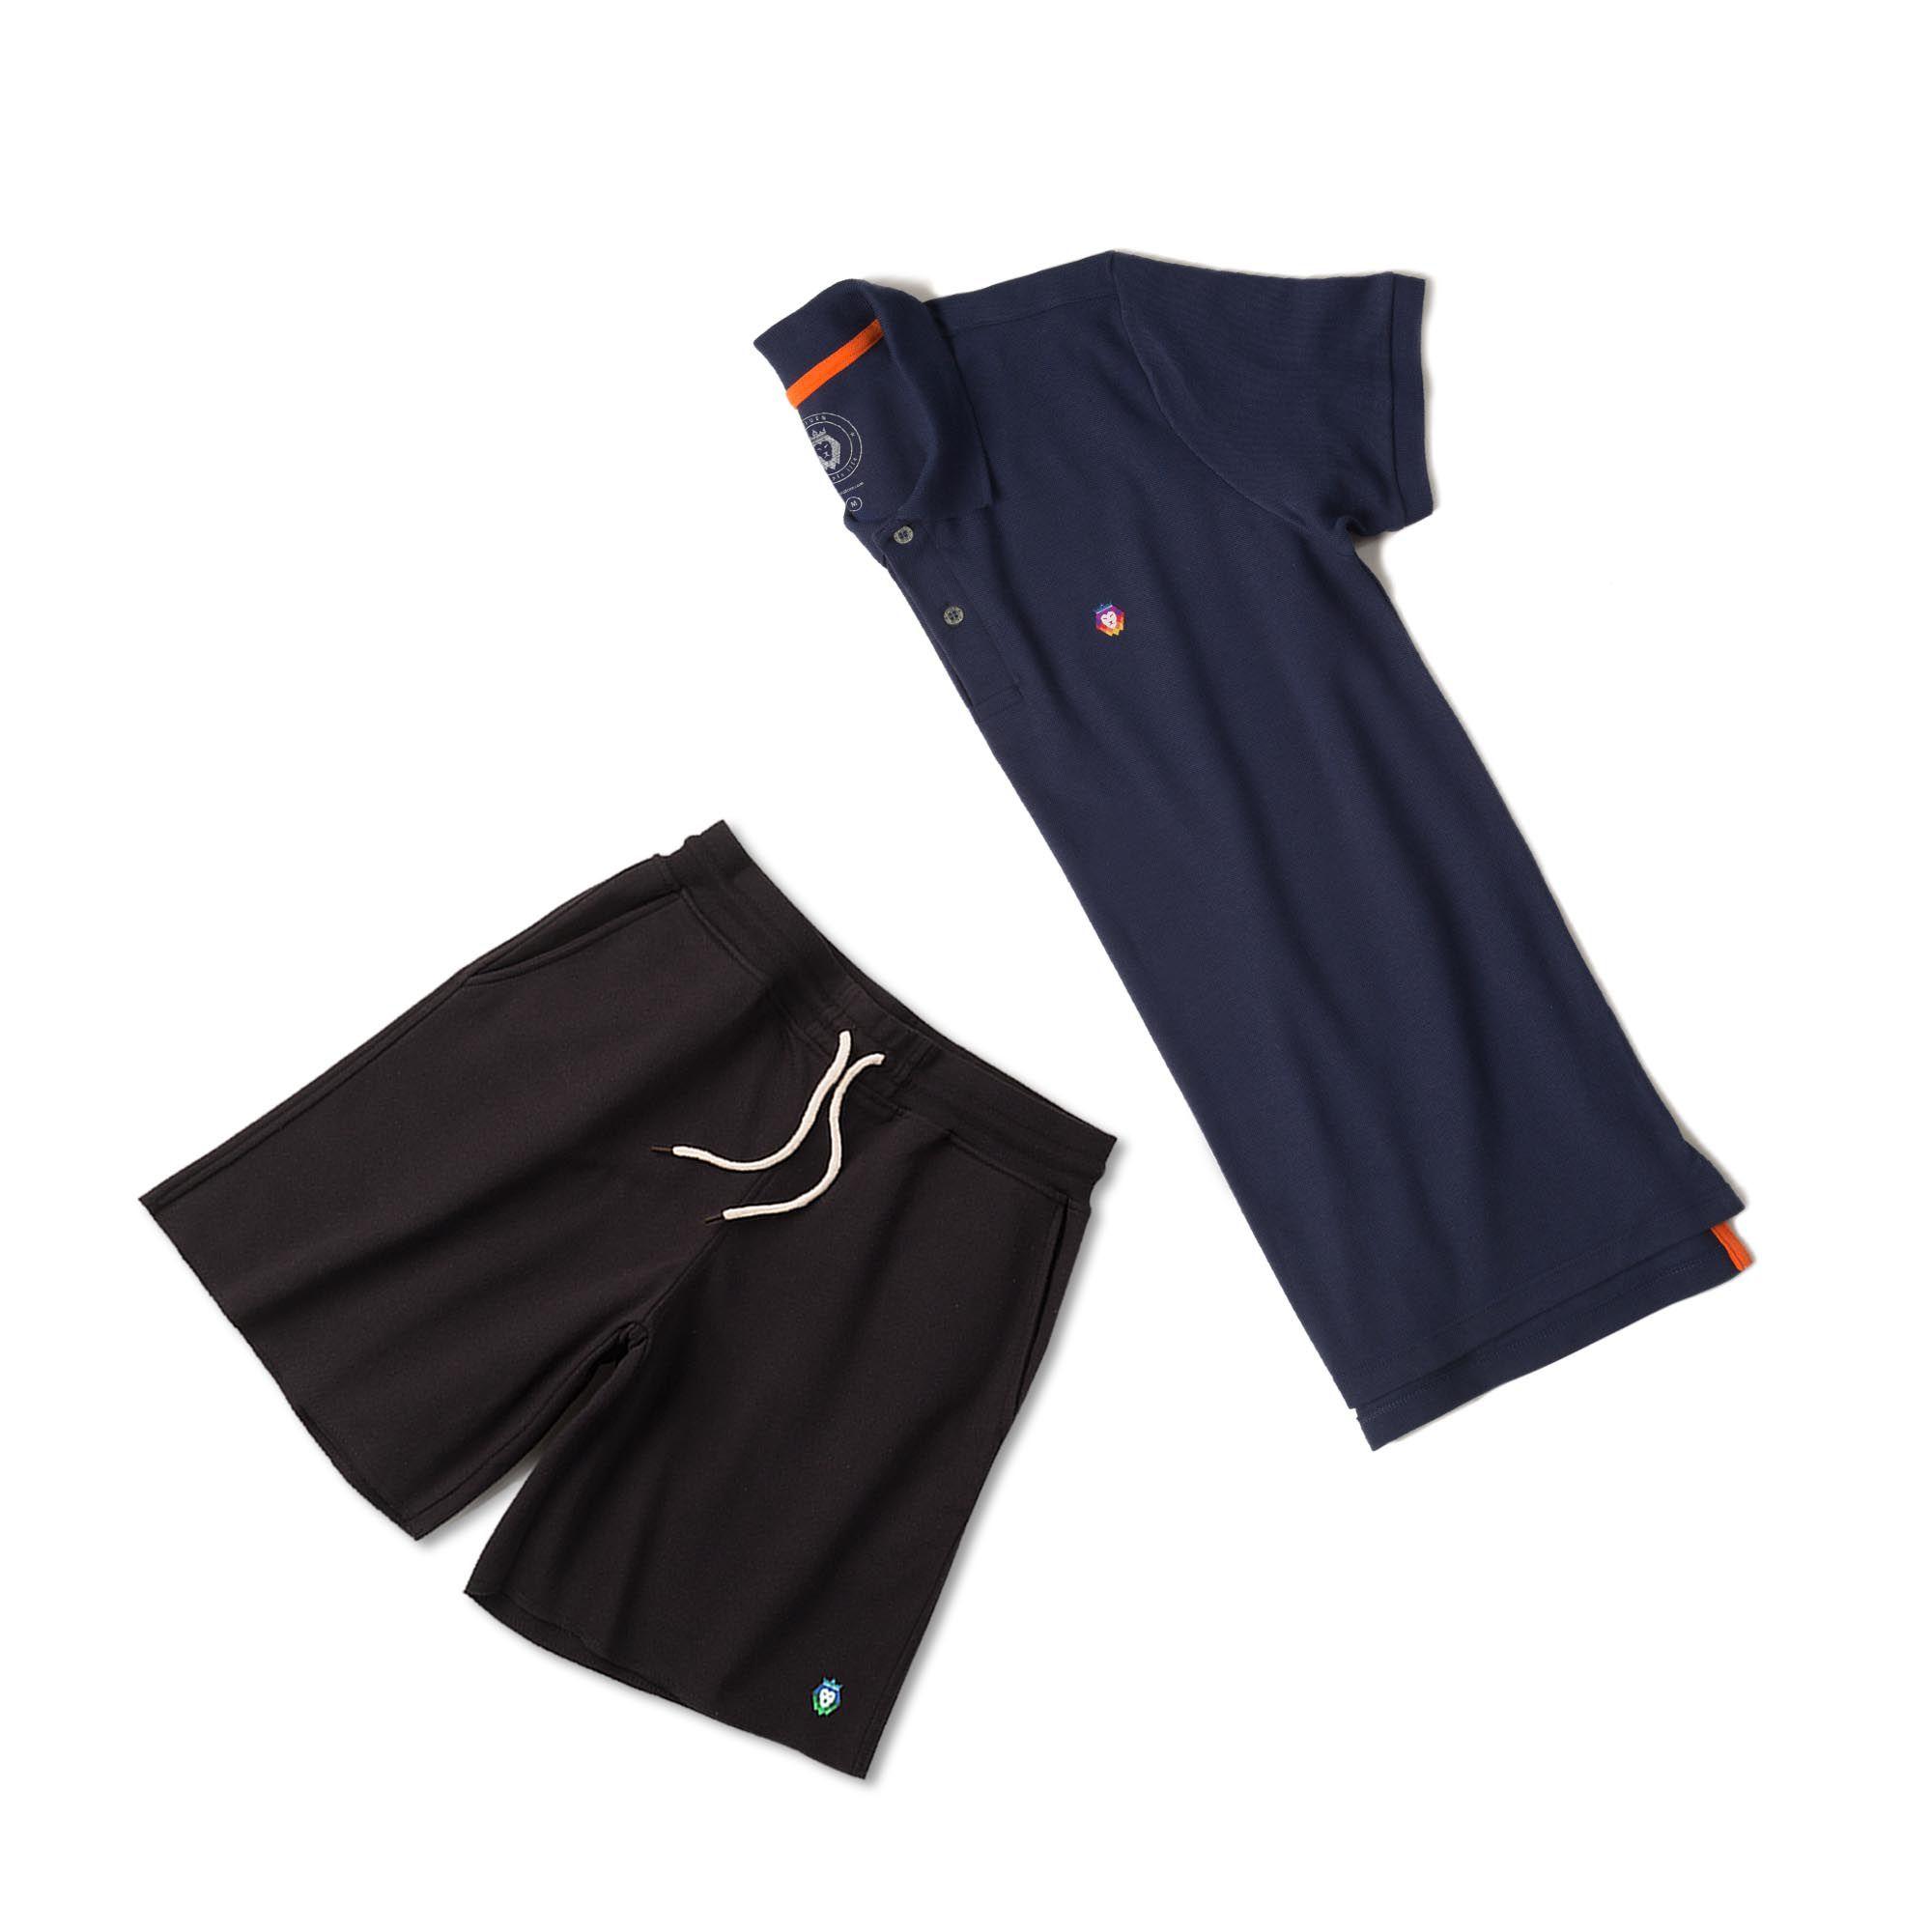 de7ae4a89 ... Kit 1 Bermuda Basic Preta + 1 Camisa Polo Style Azul Marinho Zaiden  Masculina